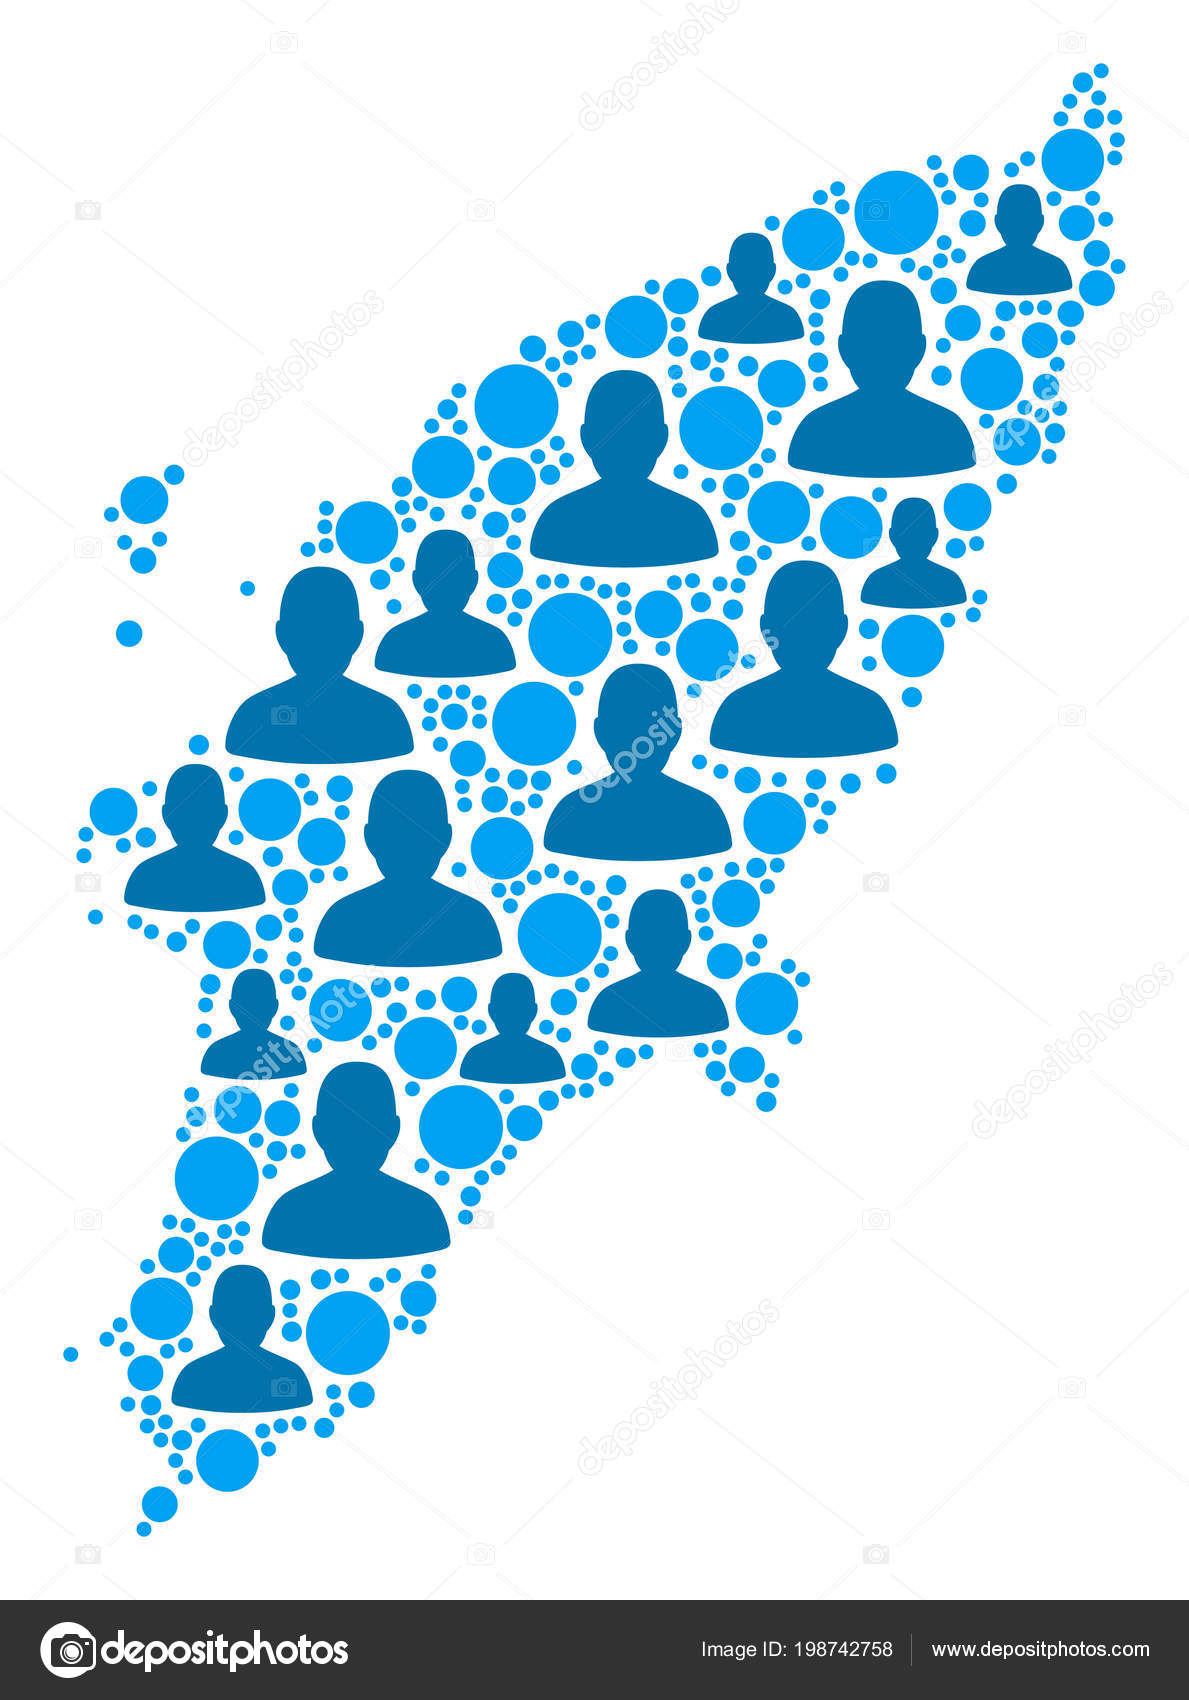 Rhodos Karte.Griechische Insel Rhodos Karte Bevölkerung Demographie Stockvektor